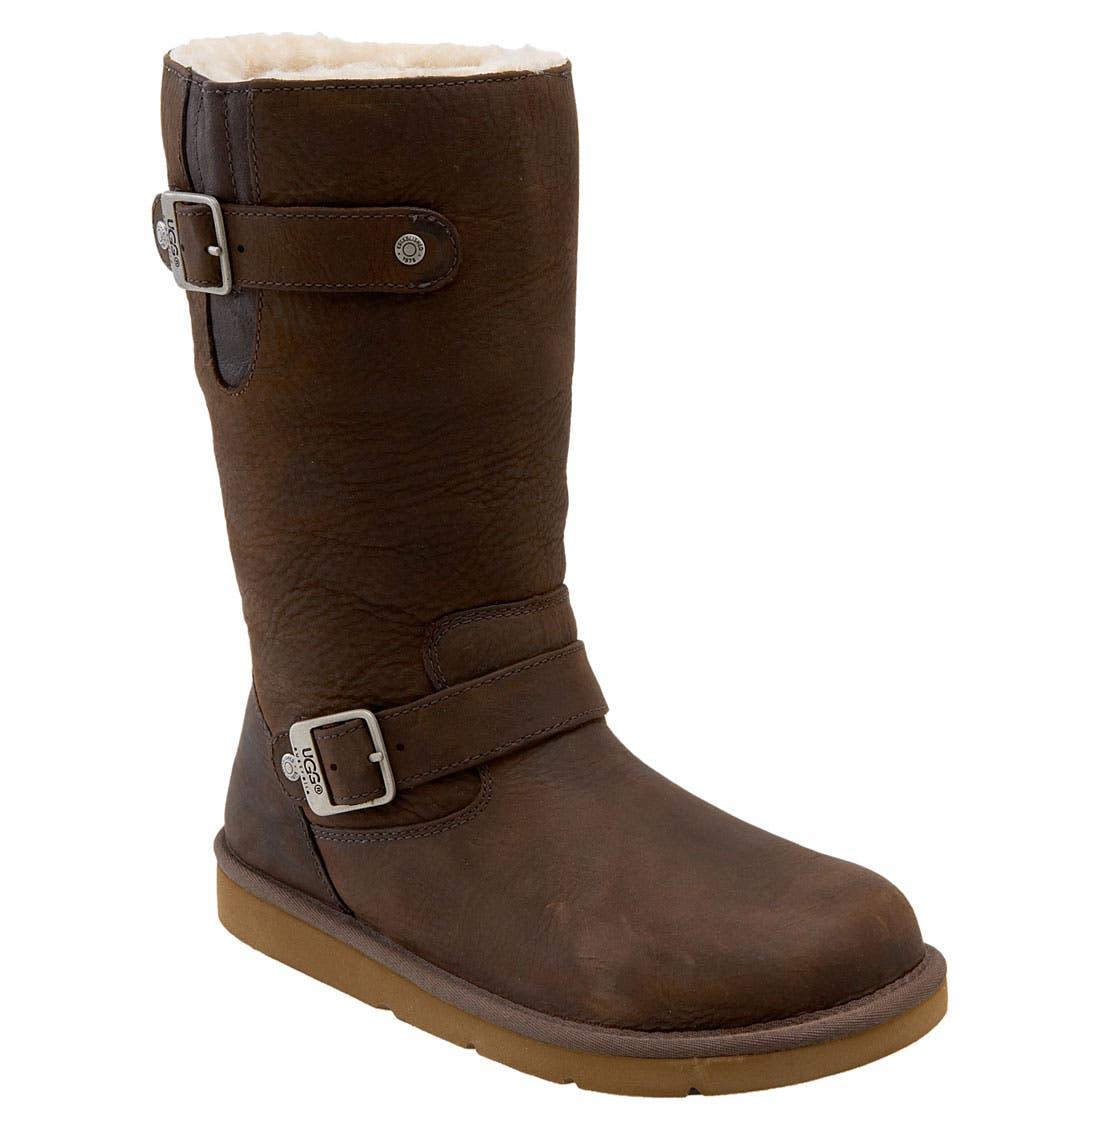 Alternate Image 1 Selected - UGG® Australia 'Kensington' Boot (Women)